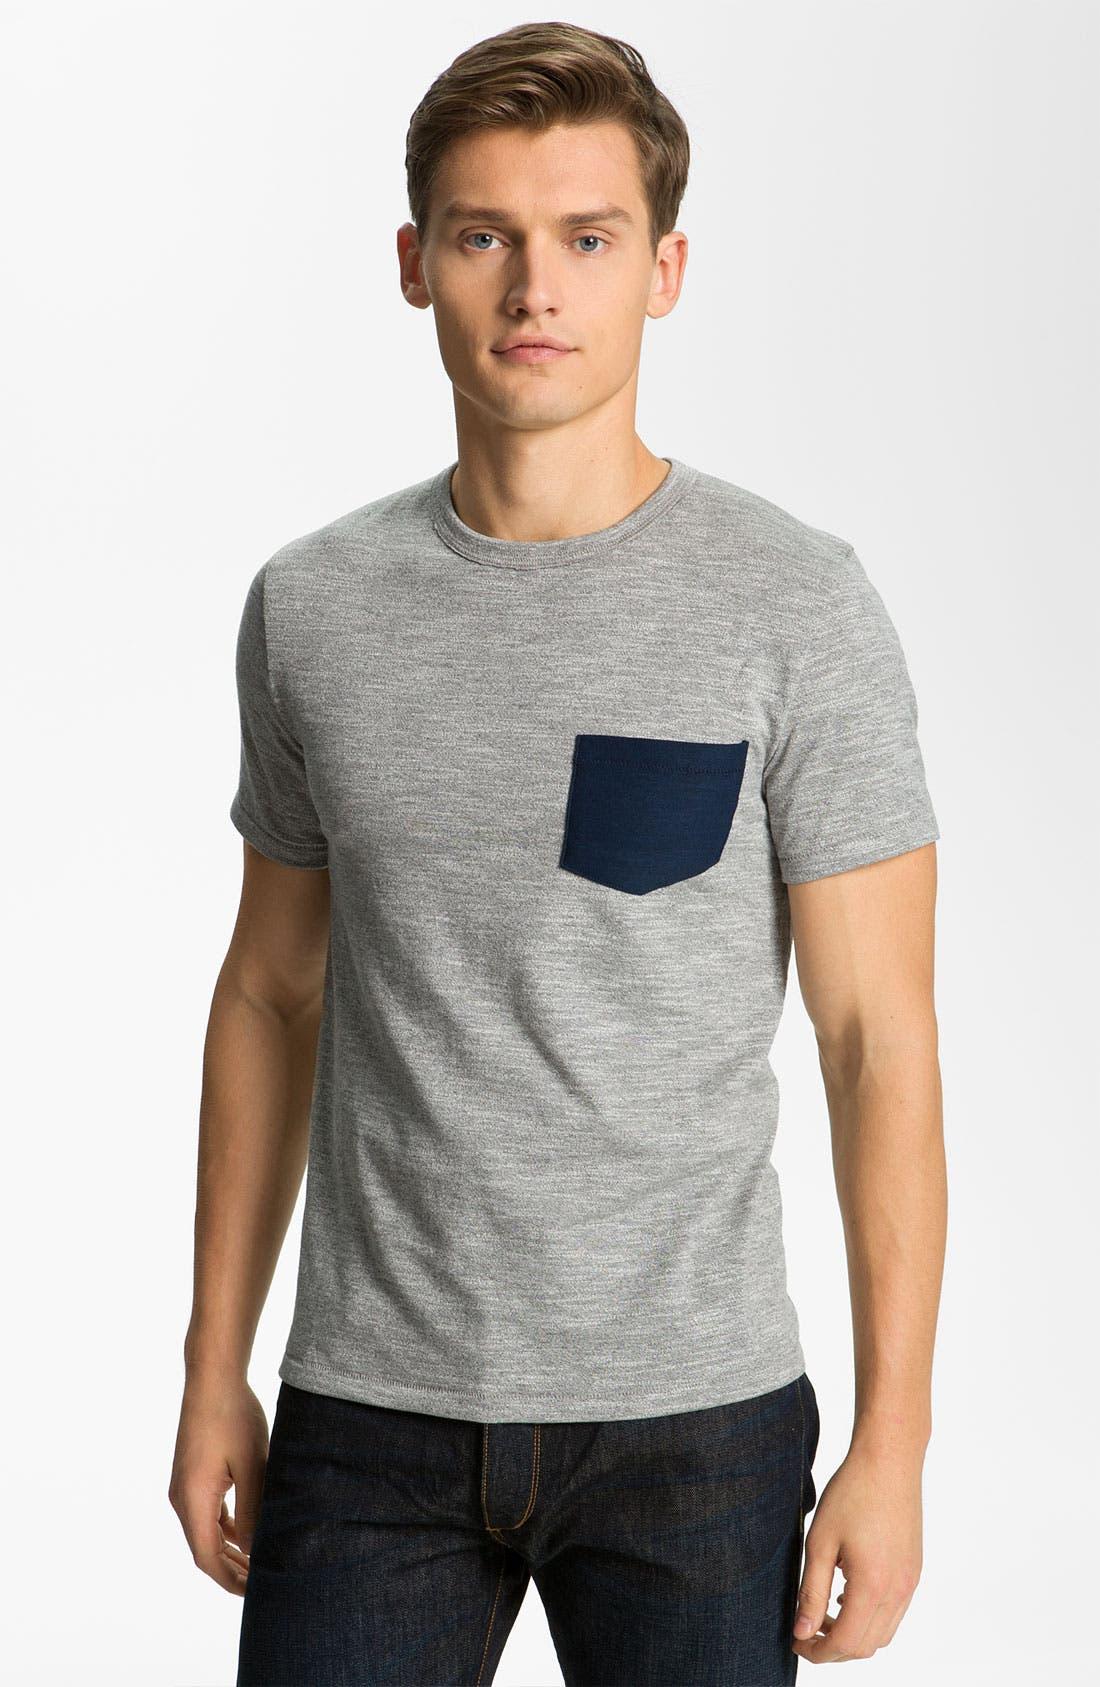 Alternate Image 1 Selected - rag & bone Pocket Crewneck T-Shirt